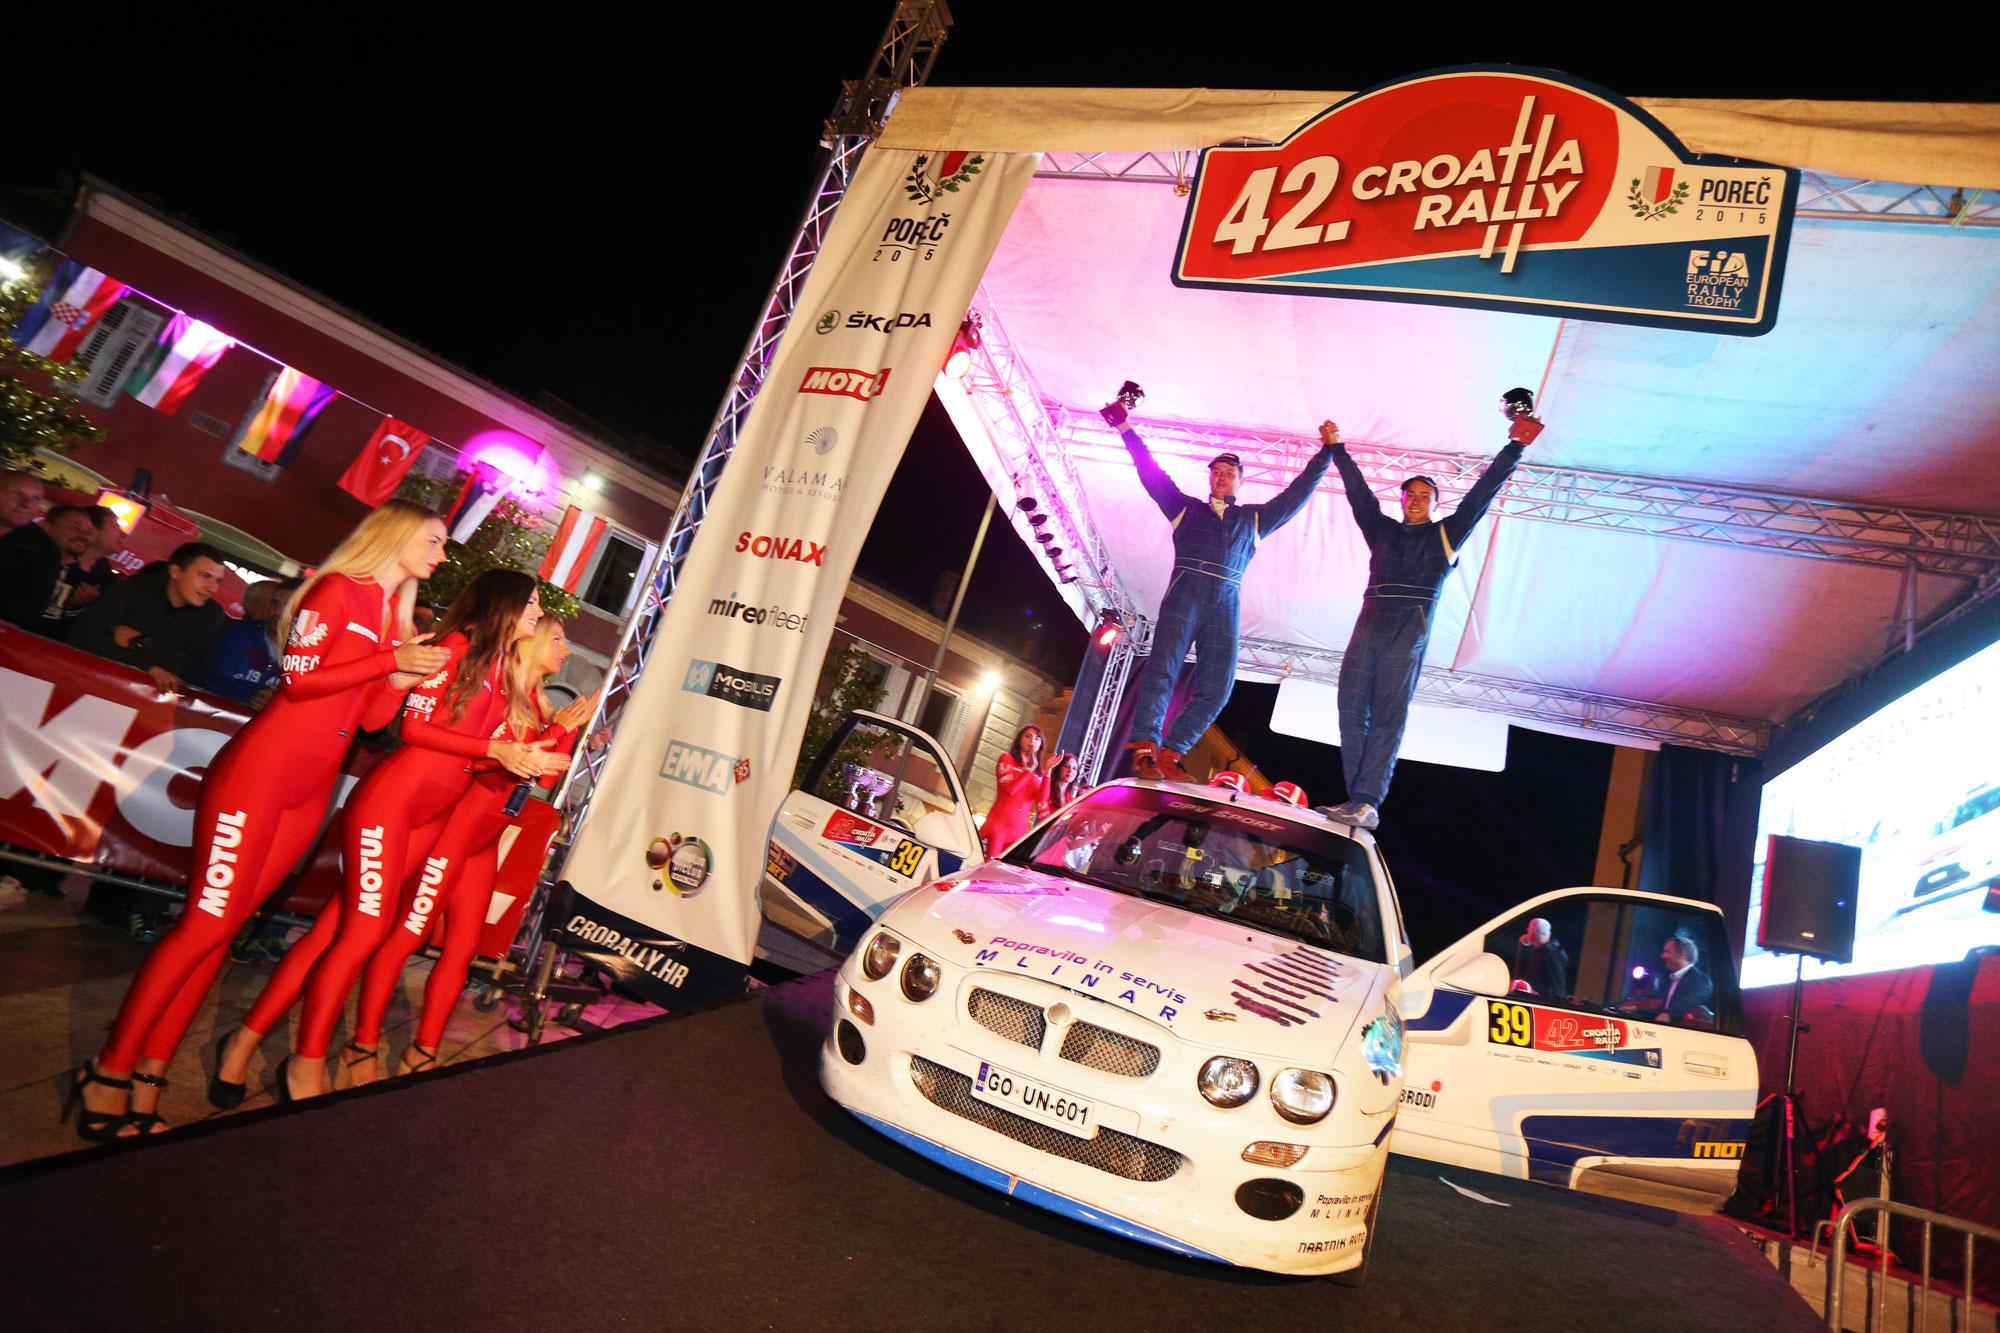 Opv Šport na Croatia rallyju do naslova državnih prvakov